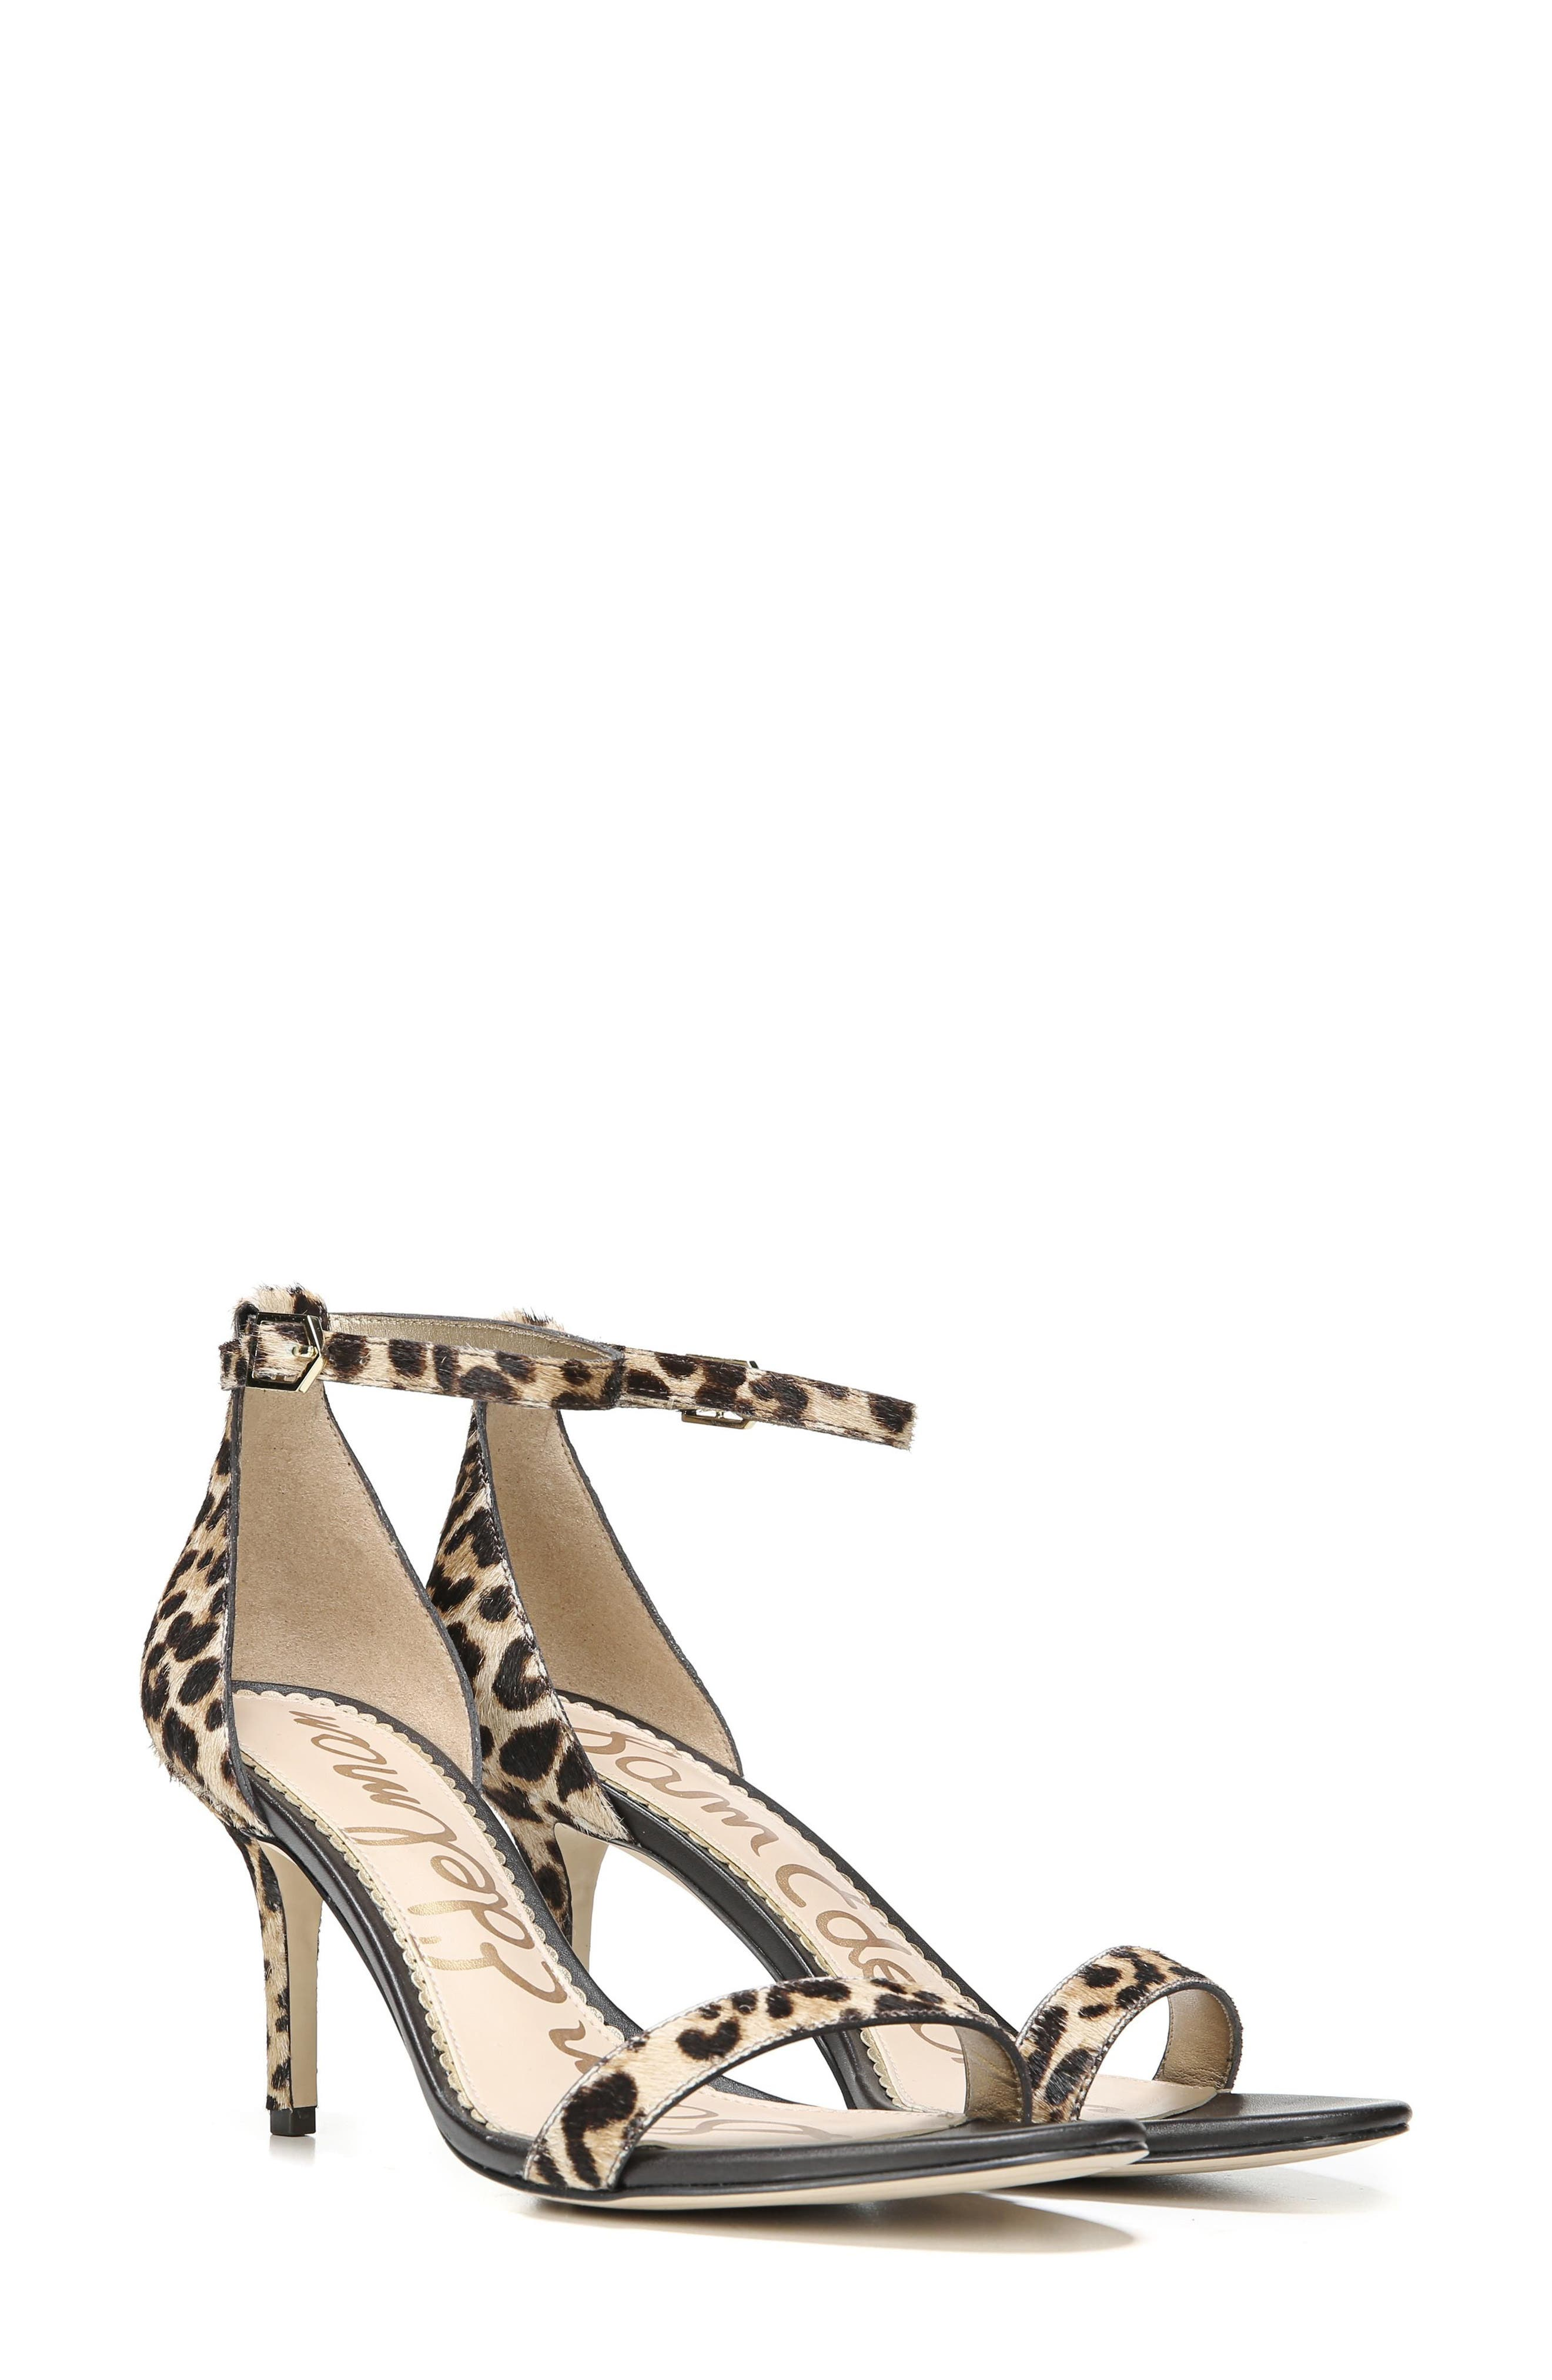 ,                             'Patti' Ankle Strap Sandal,                             Alternate thumbnail 69, color,                             200